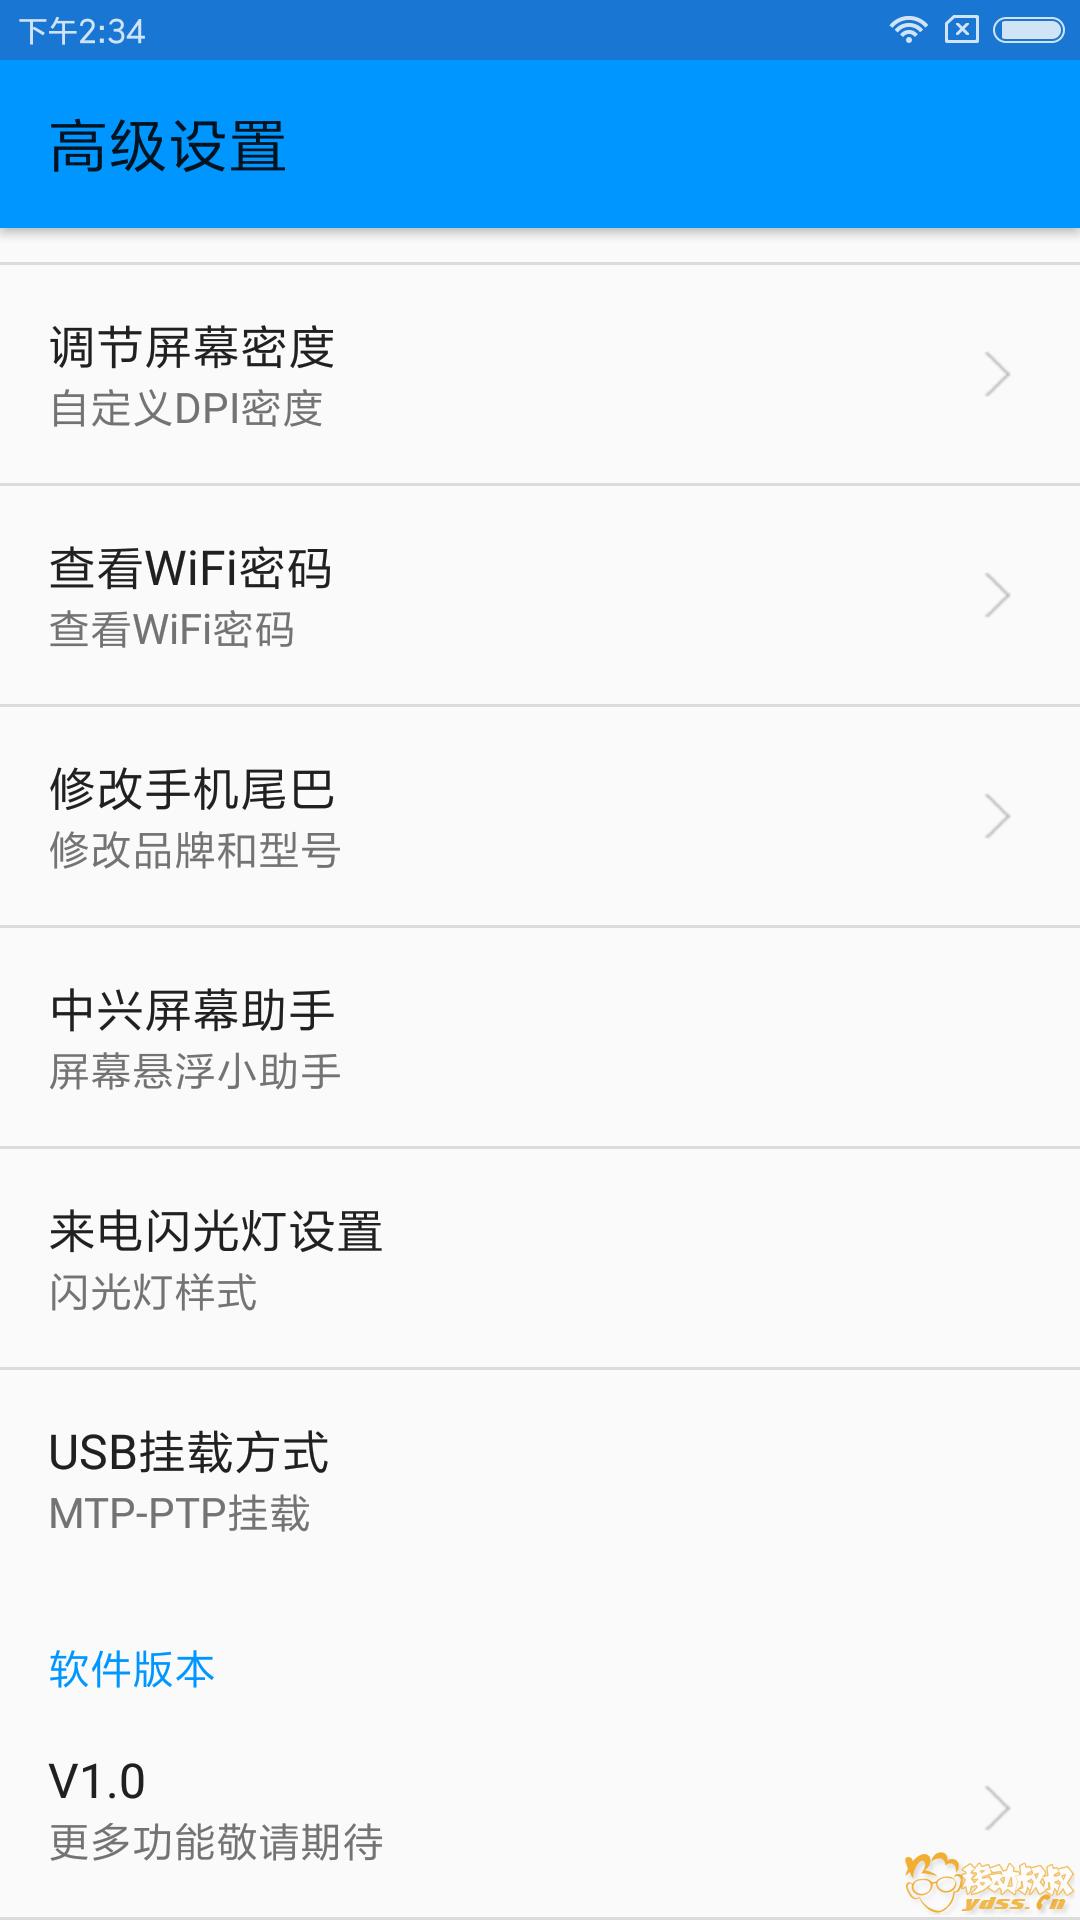 Screenshot_2017-11-07-14-34-07-097_com.zhanhong.tools.png